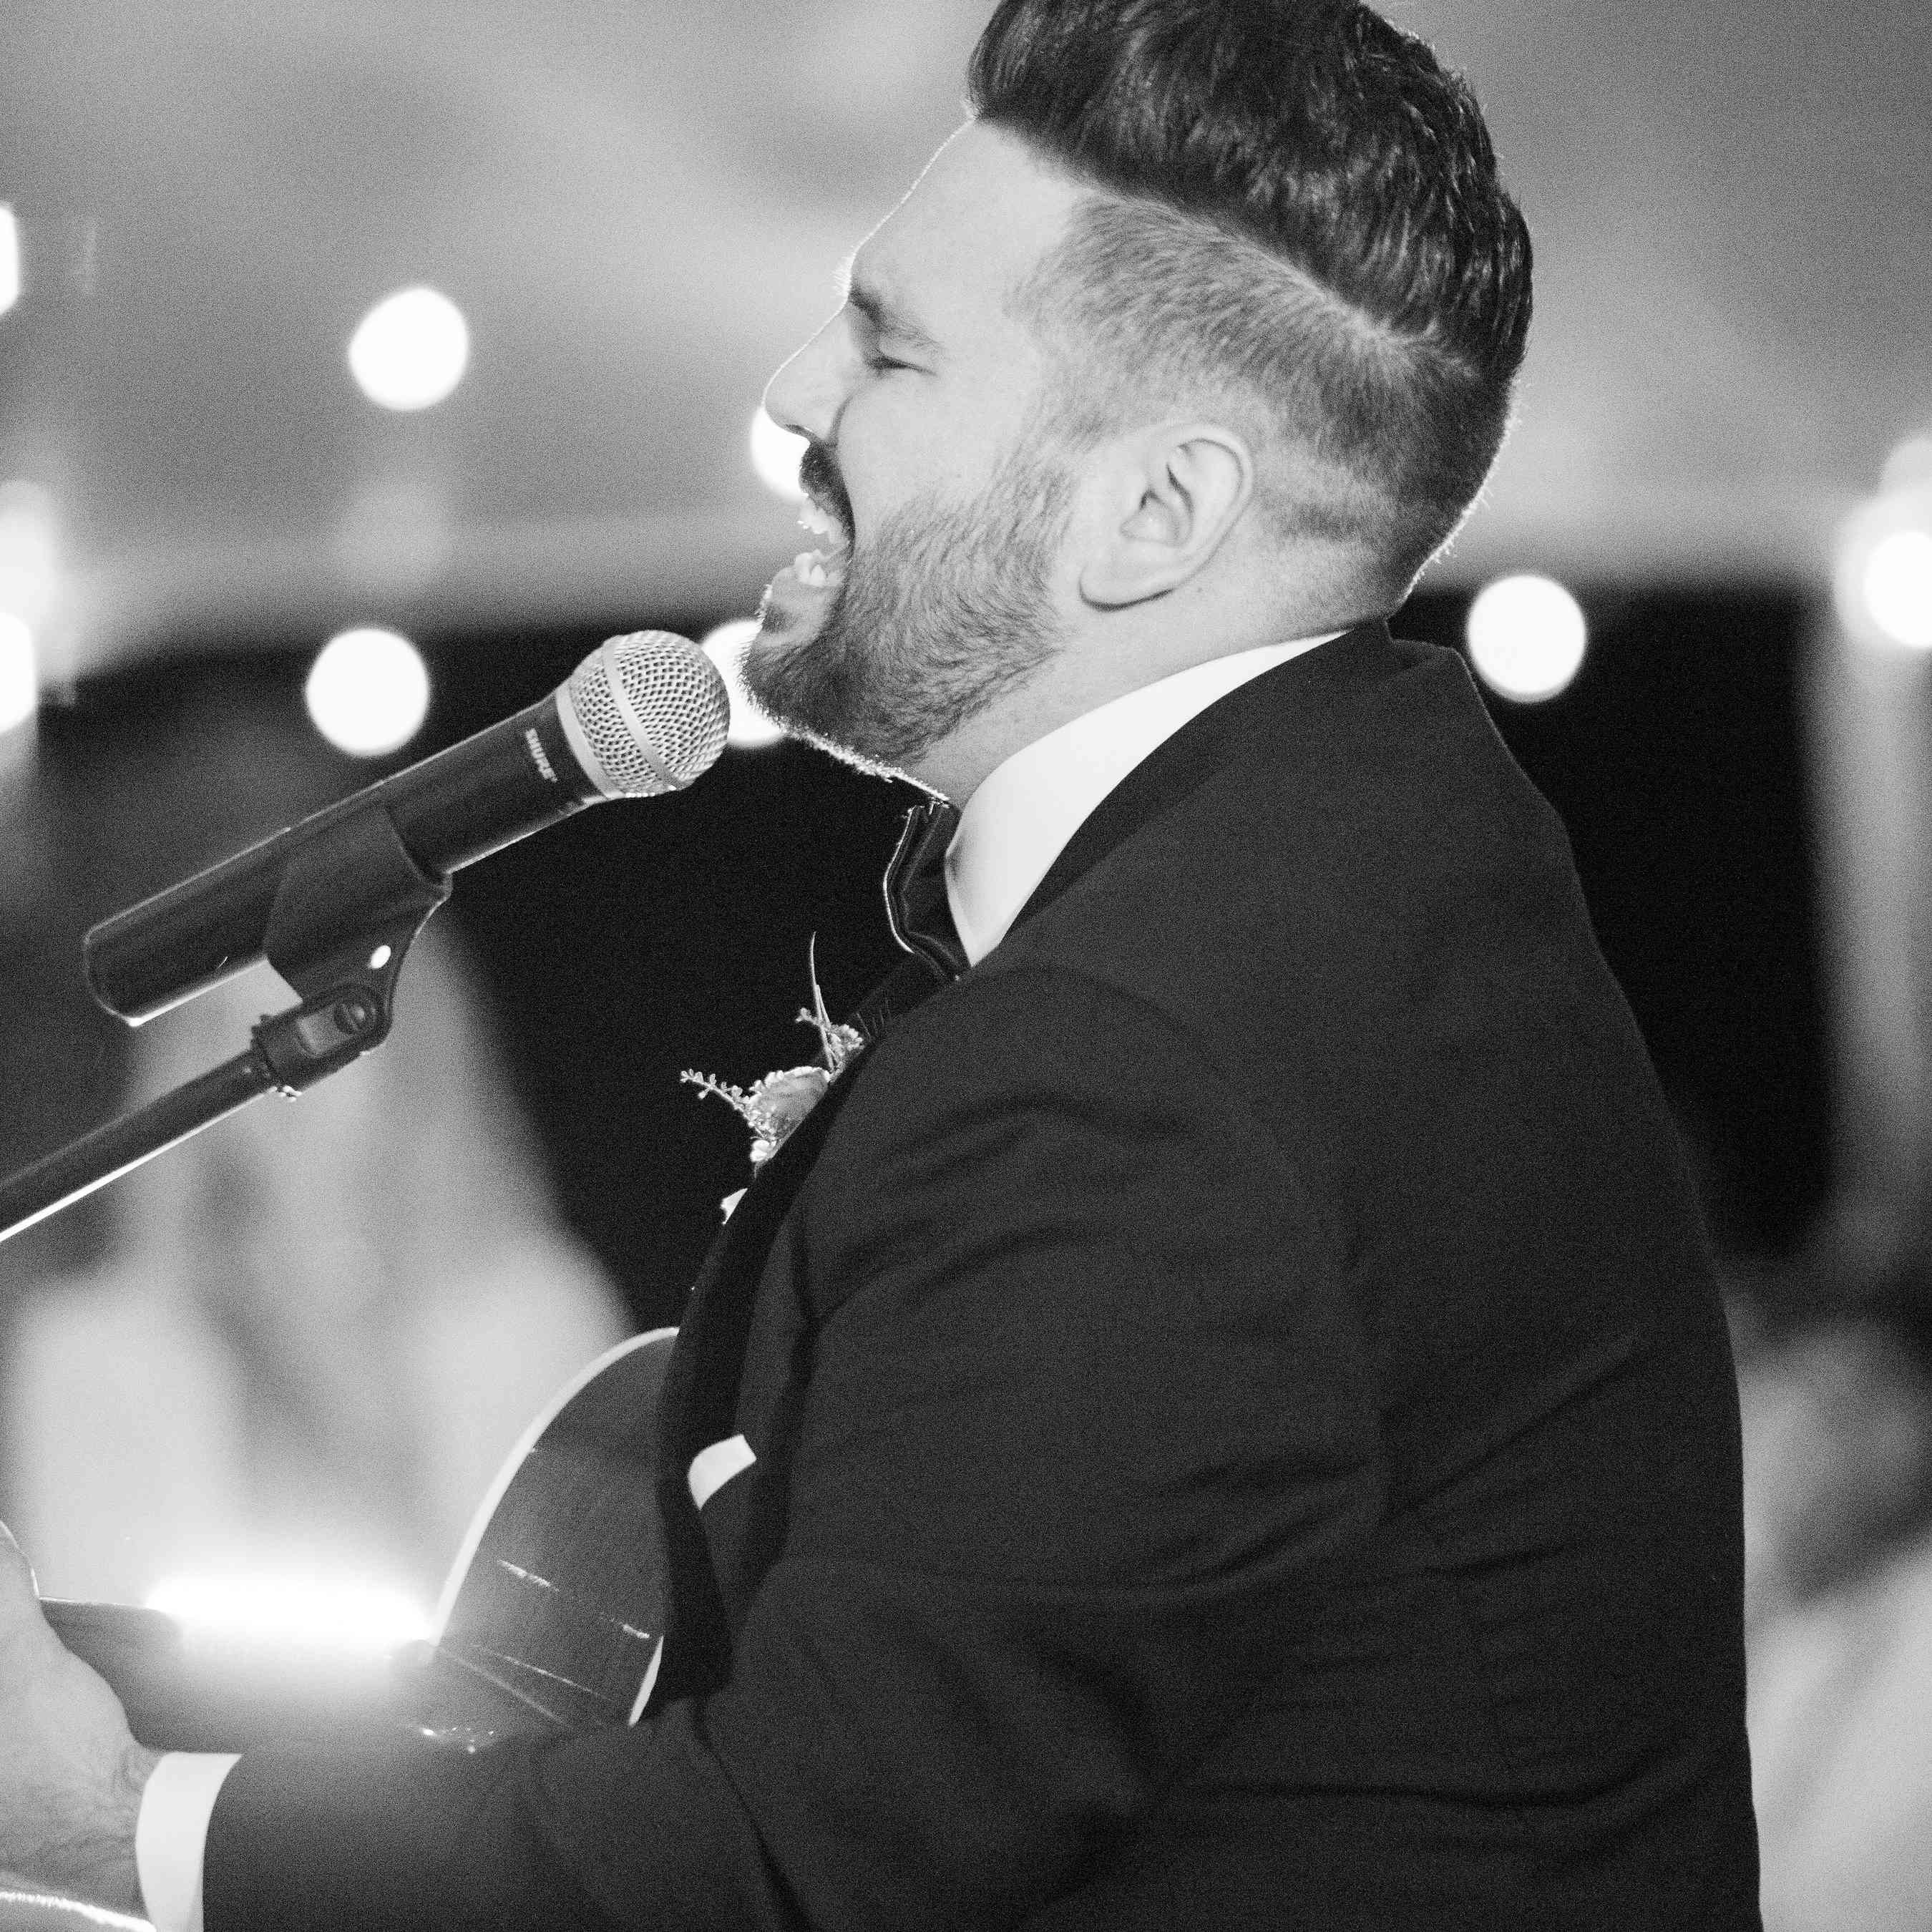 <p>Groom singing at wedding</p><br><br>